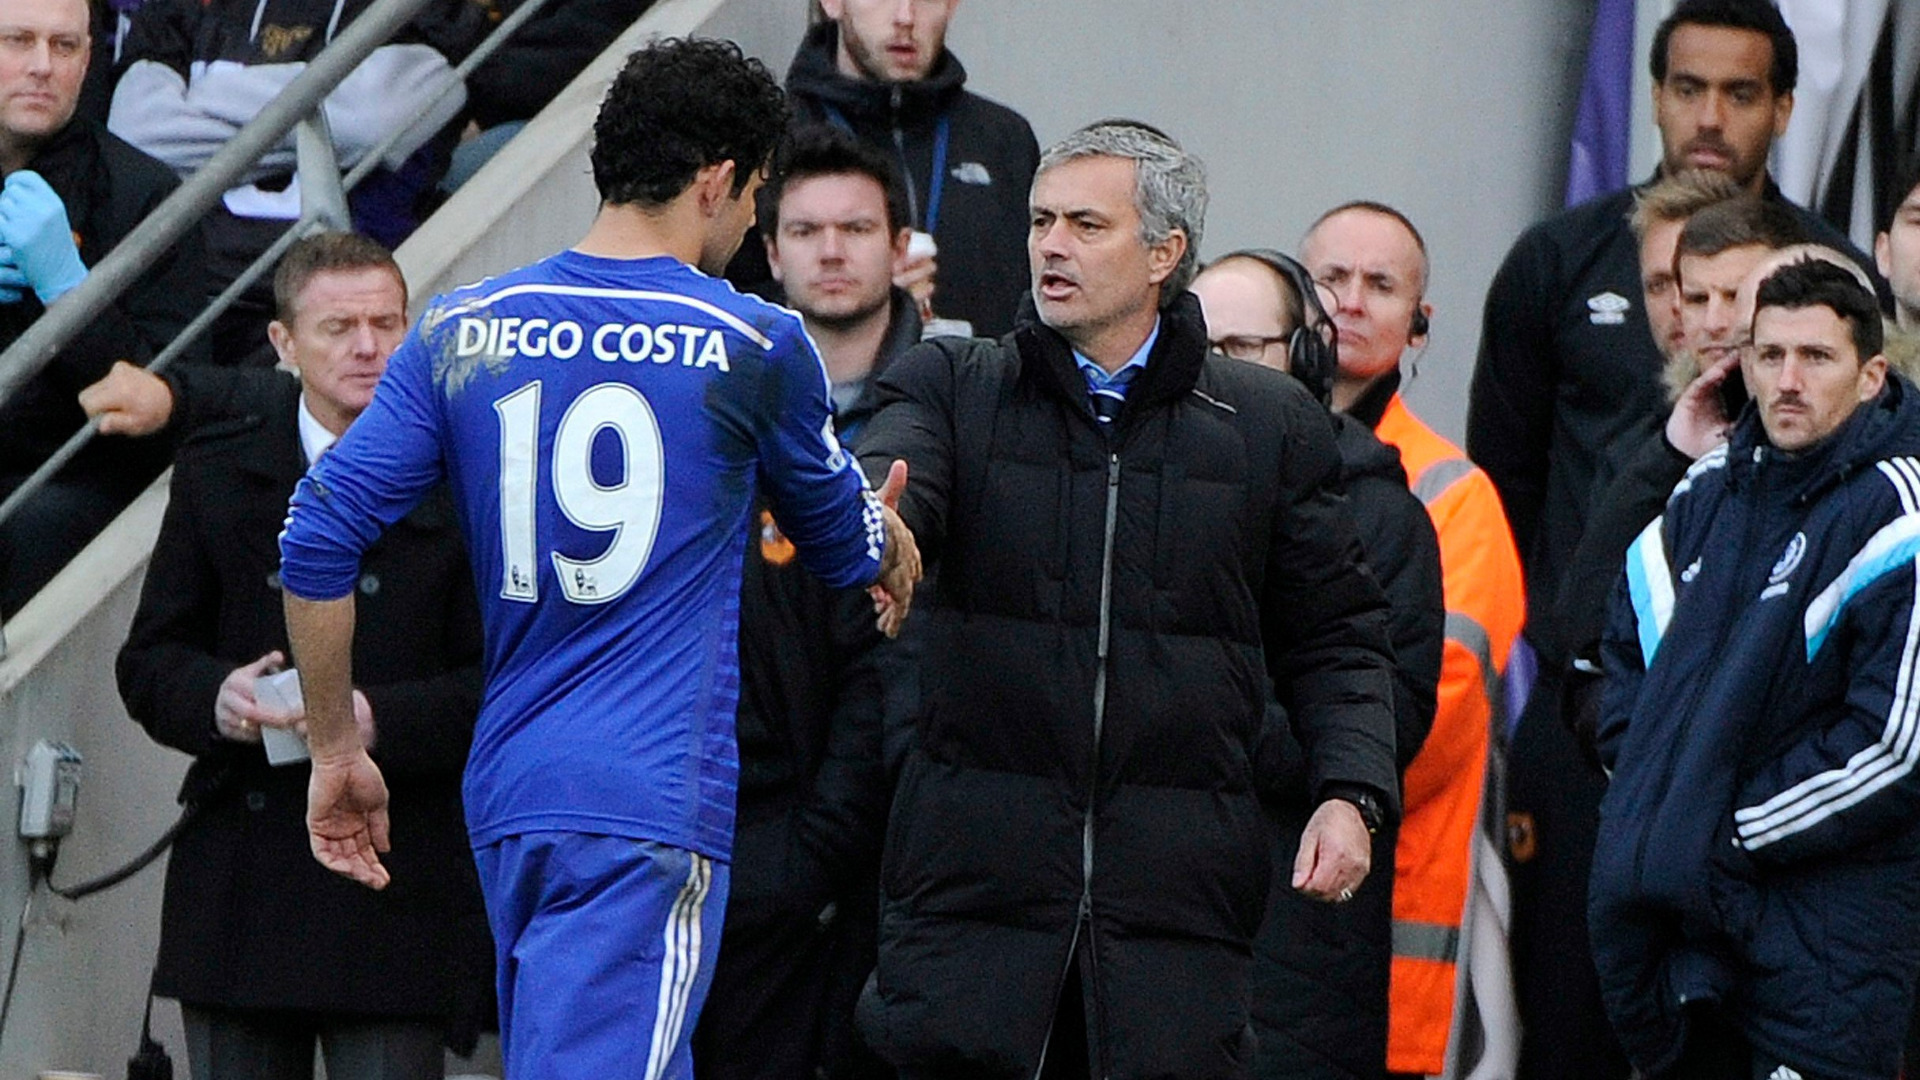 Диего Коста се разбираше добре с Жозе Моуриньо